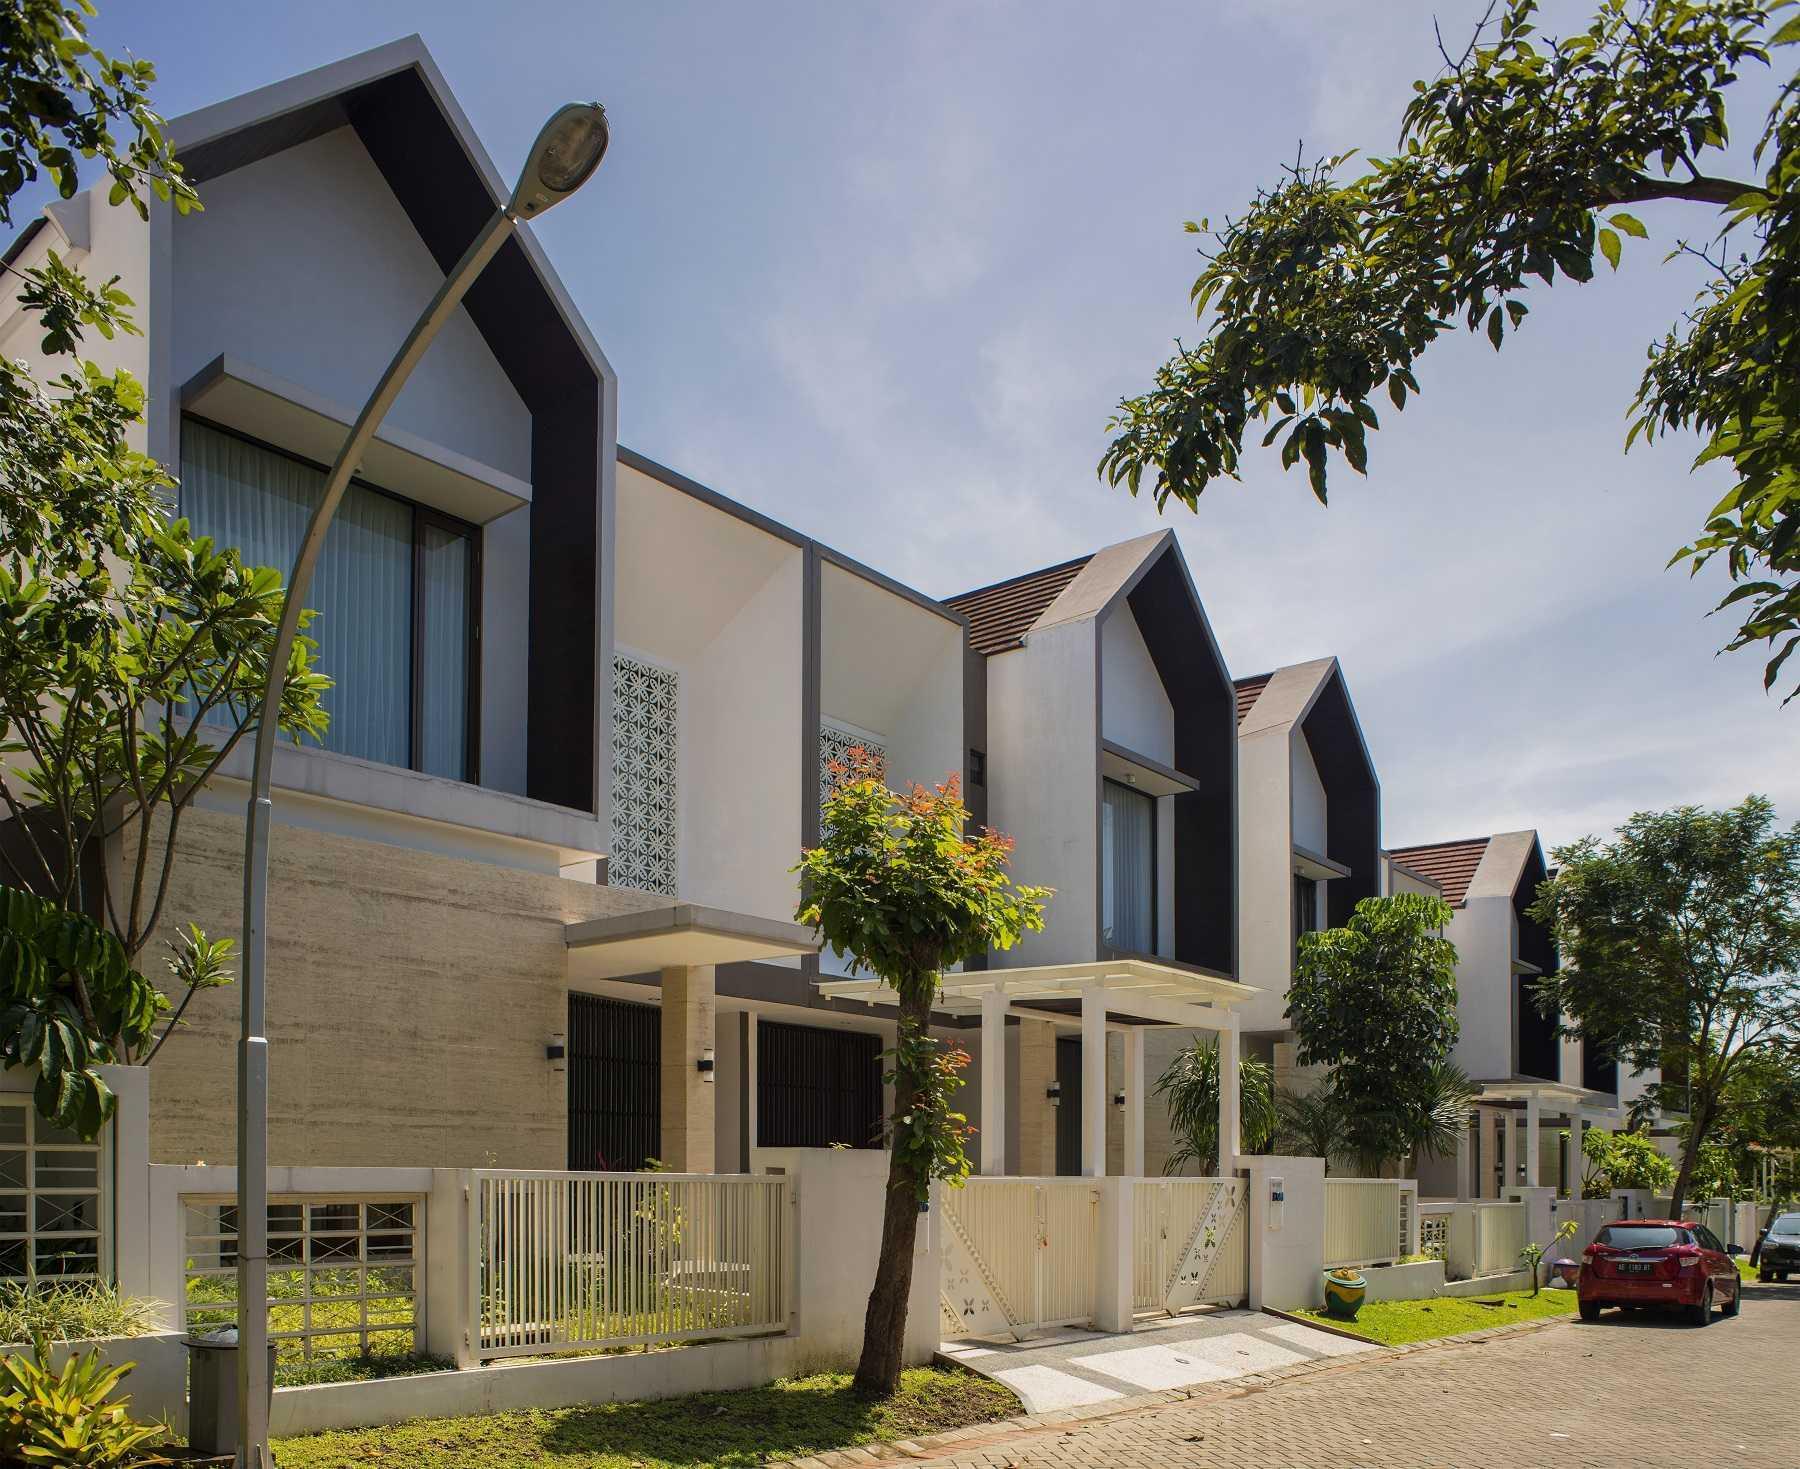 Satuvista Architect The Amogha - 140  Malang, Kota Malang, Jawa Timur, Indonesia Malang, Kota Malang, Jawa Timur, Indonesia Satuvista-Architect-The-Amogha-140- Minimalis  51543